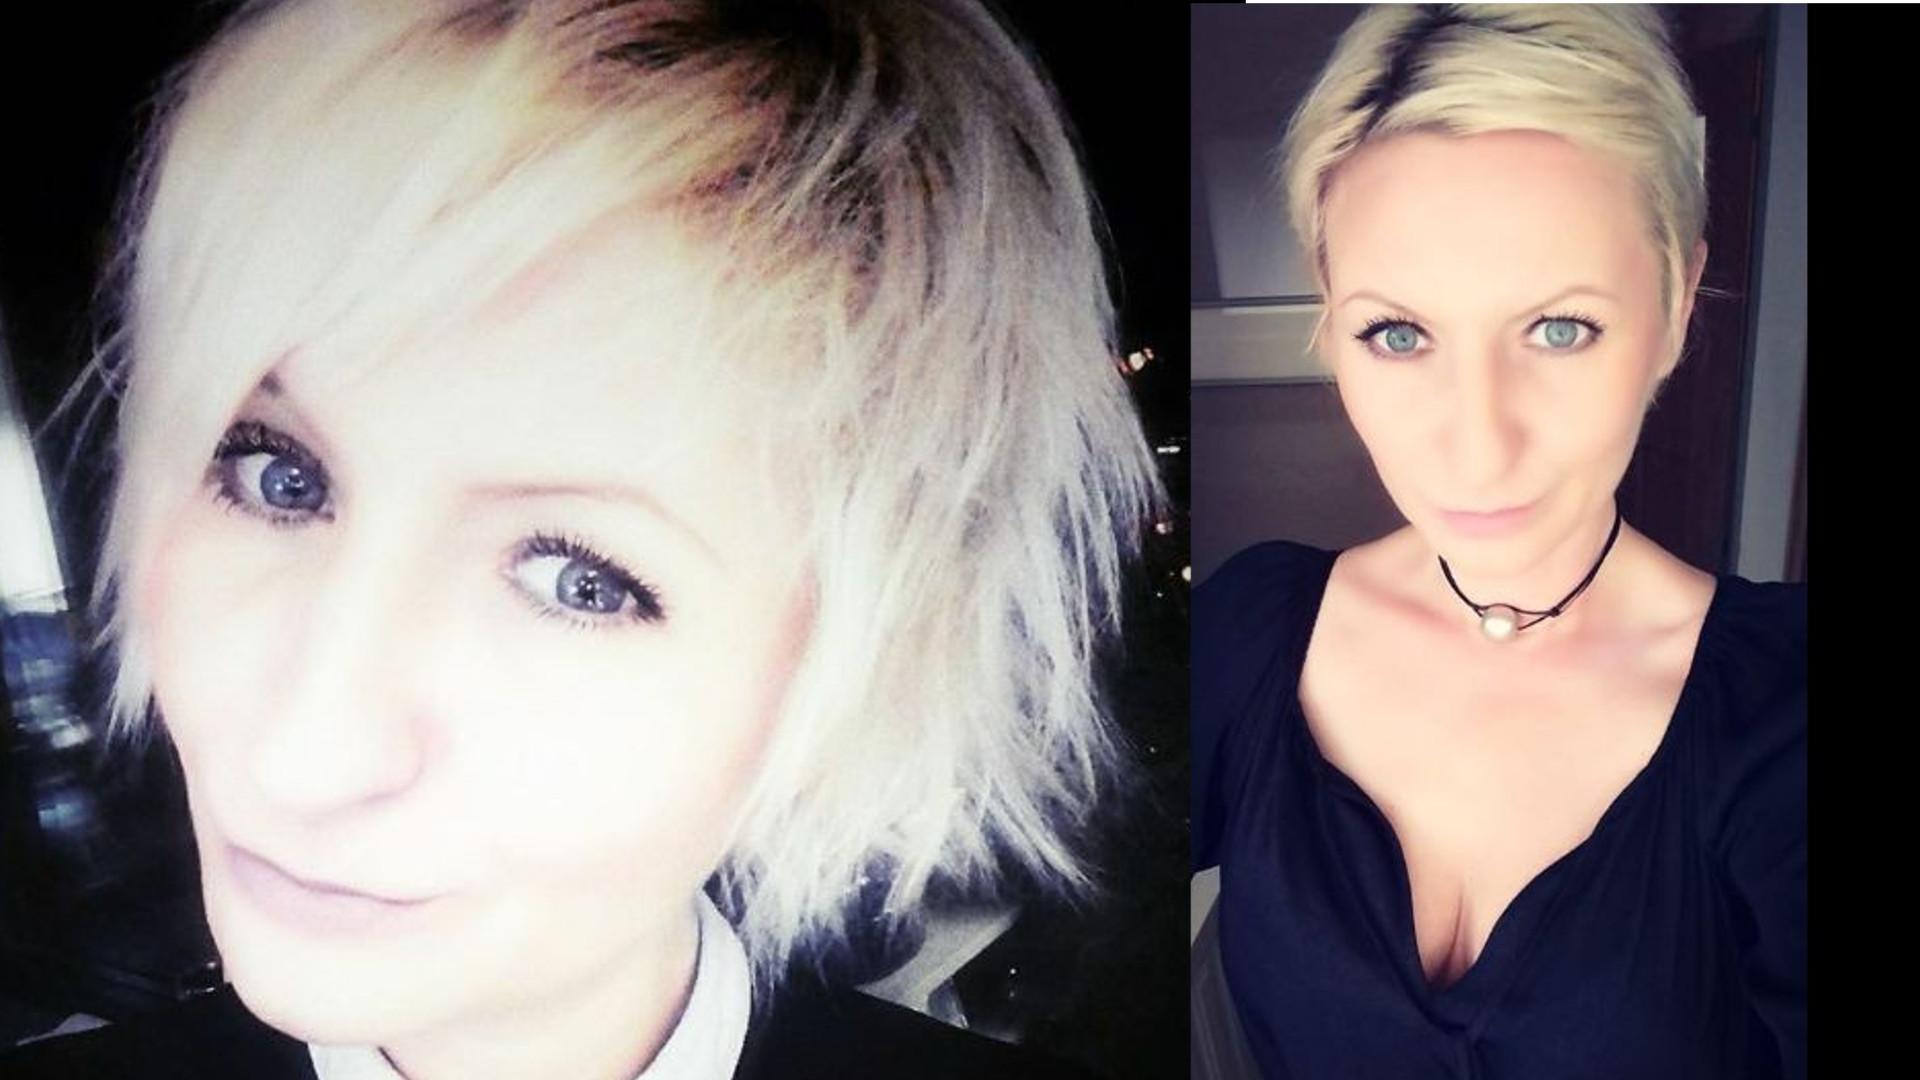 Zmarła Maja Borkowska – dziennikarka Trójki chorowała na raka